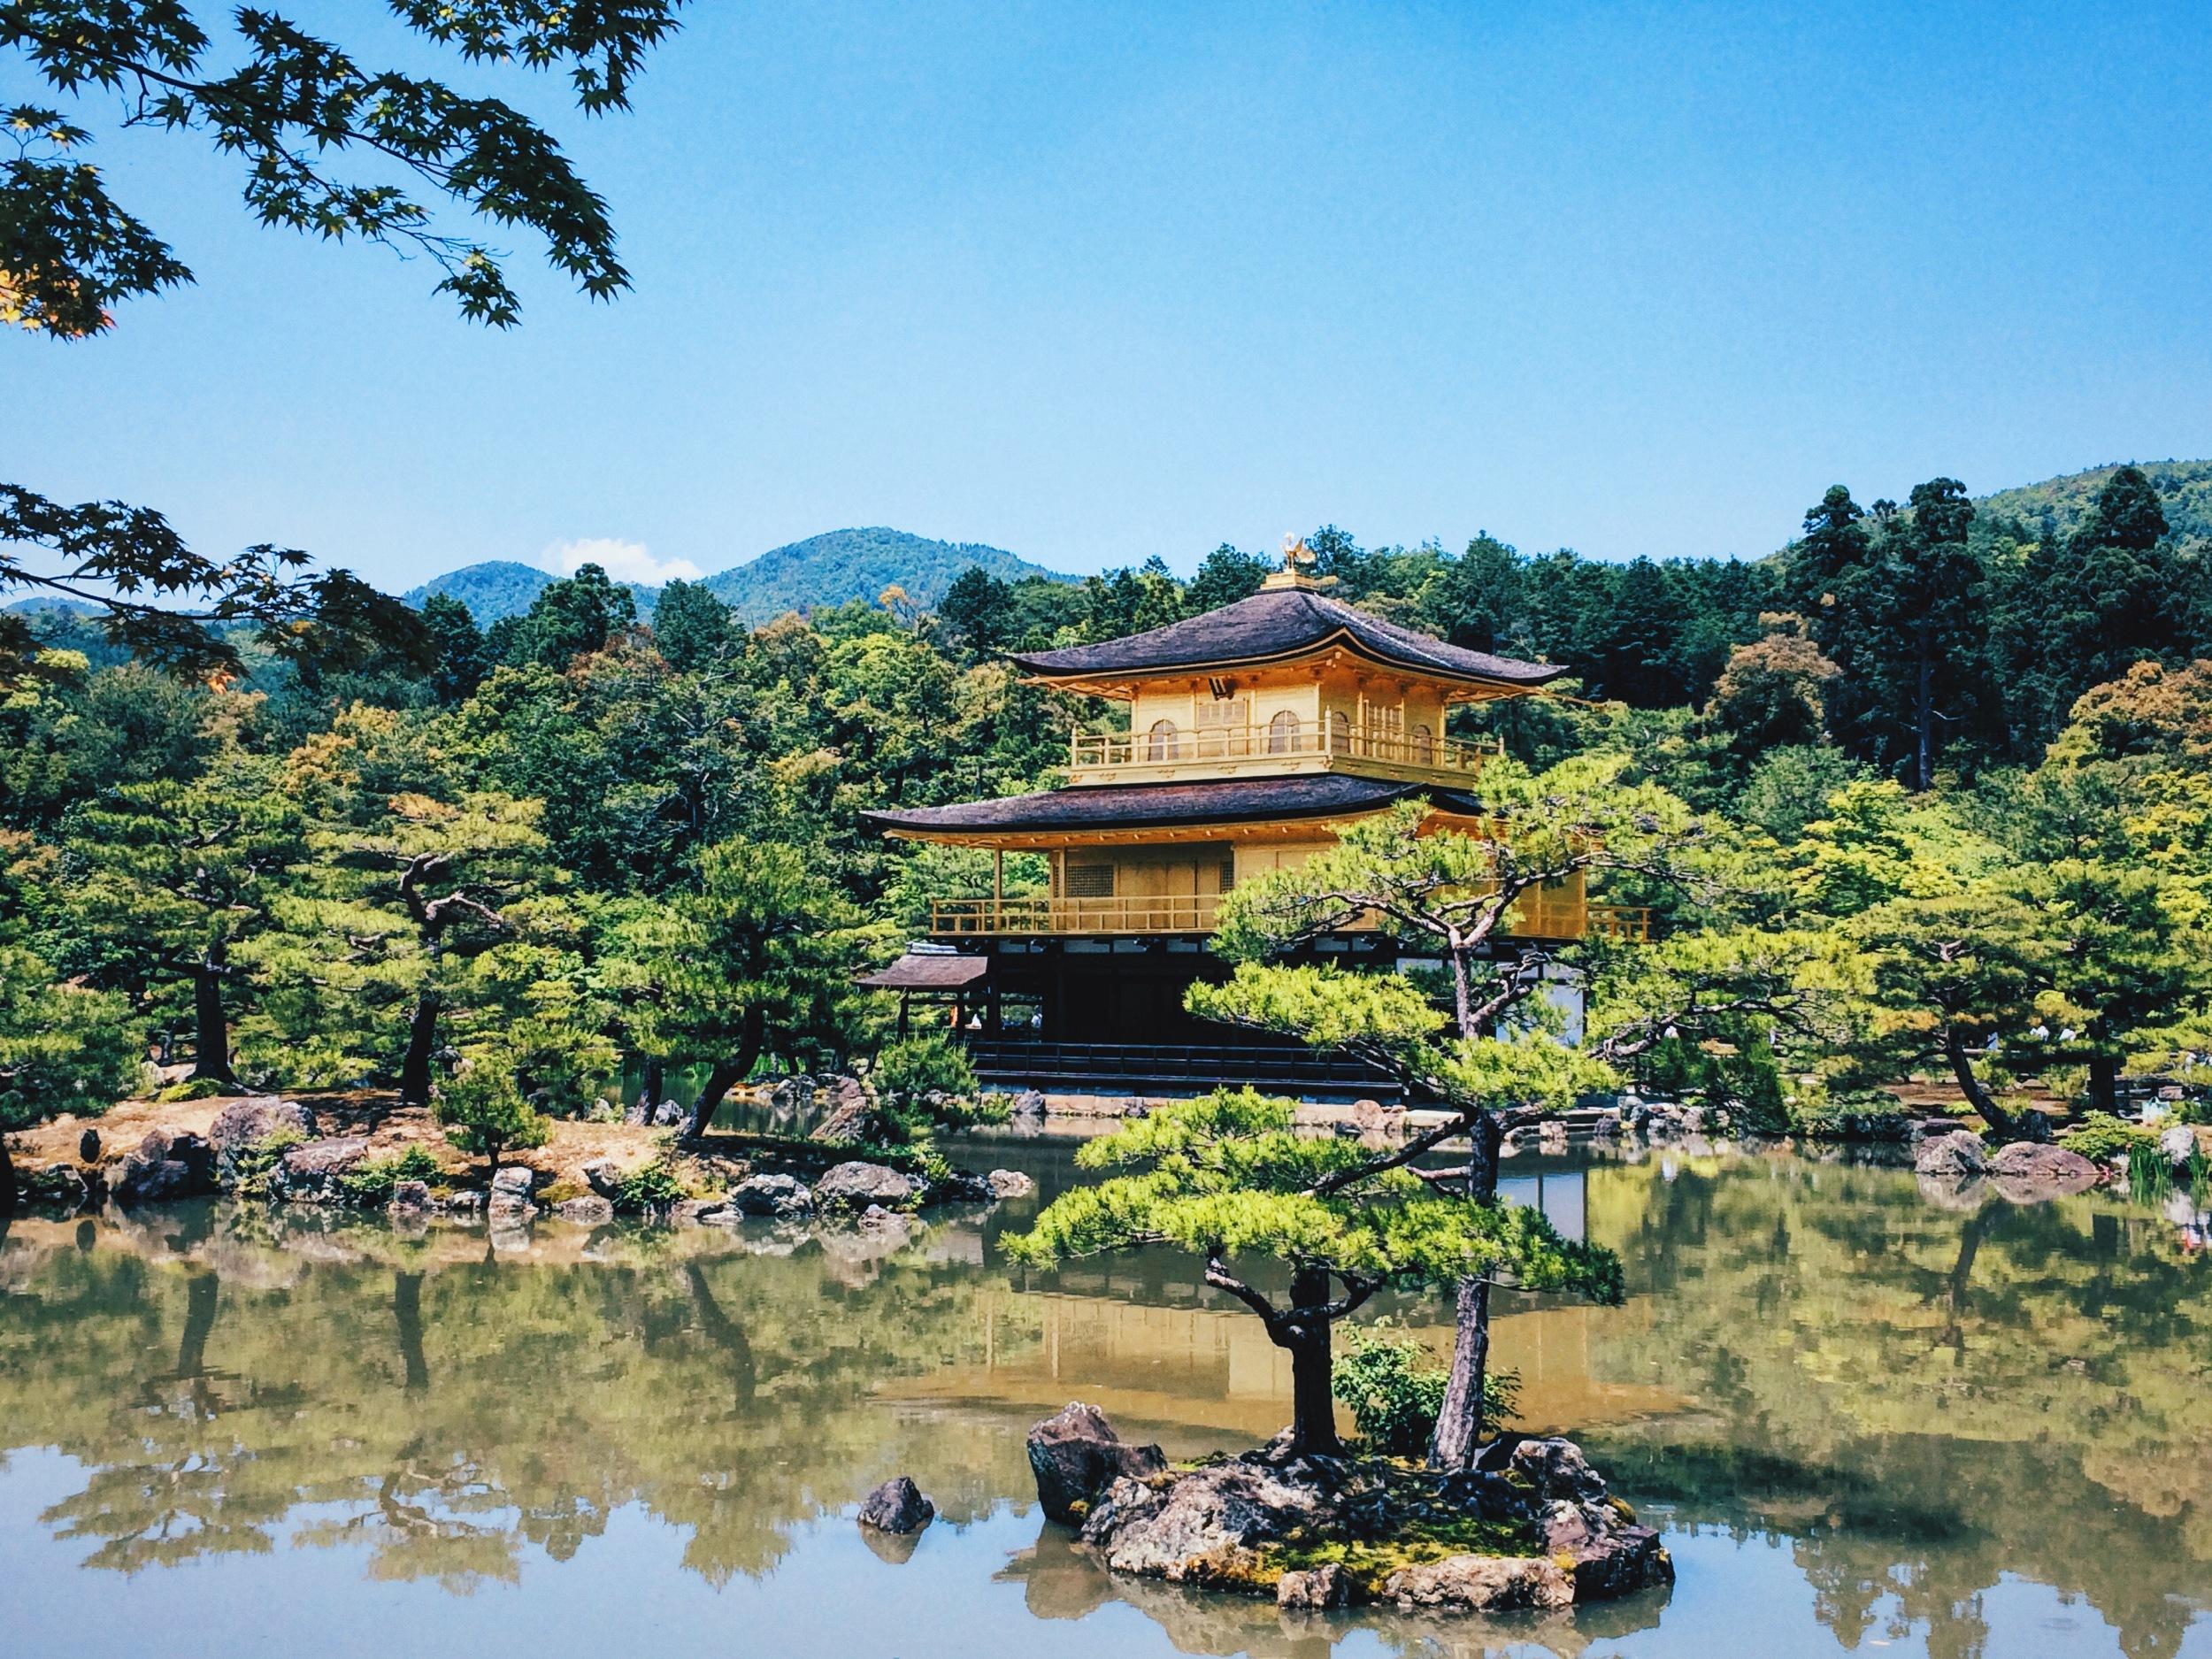 Kinkakuji - Golden Temple (photo by Joe Savinell)